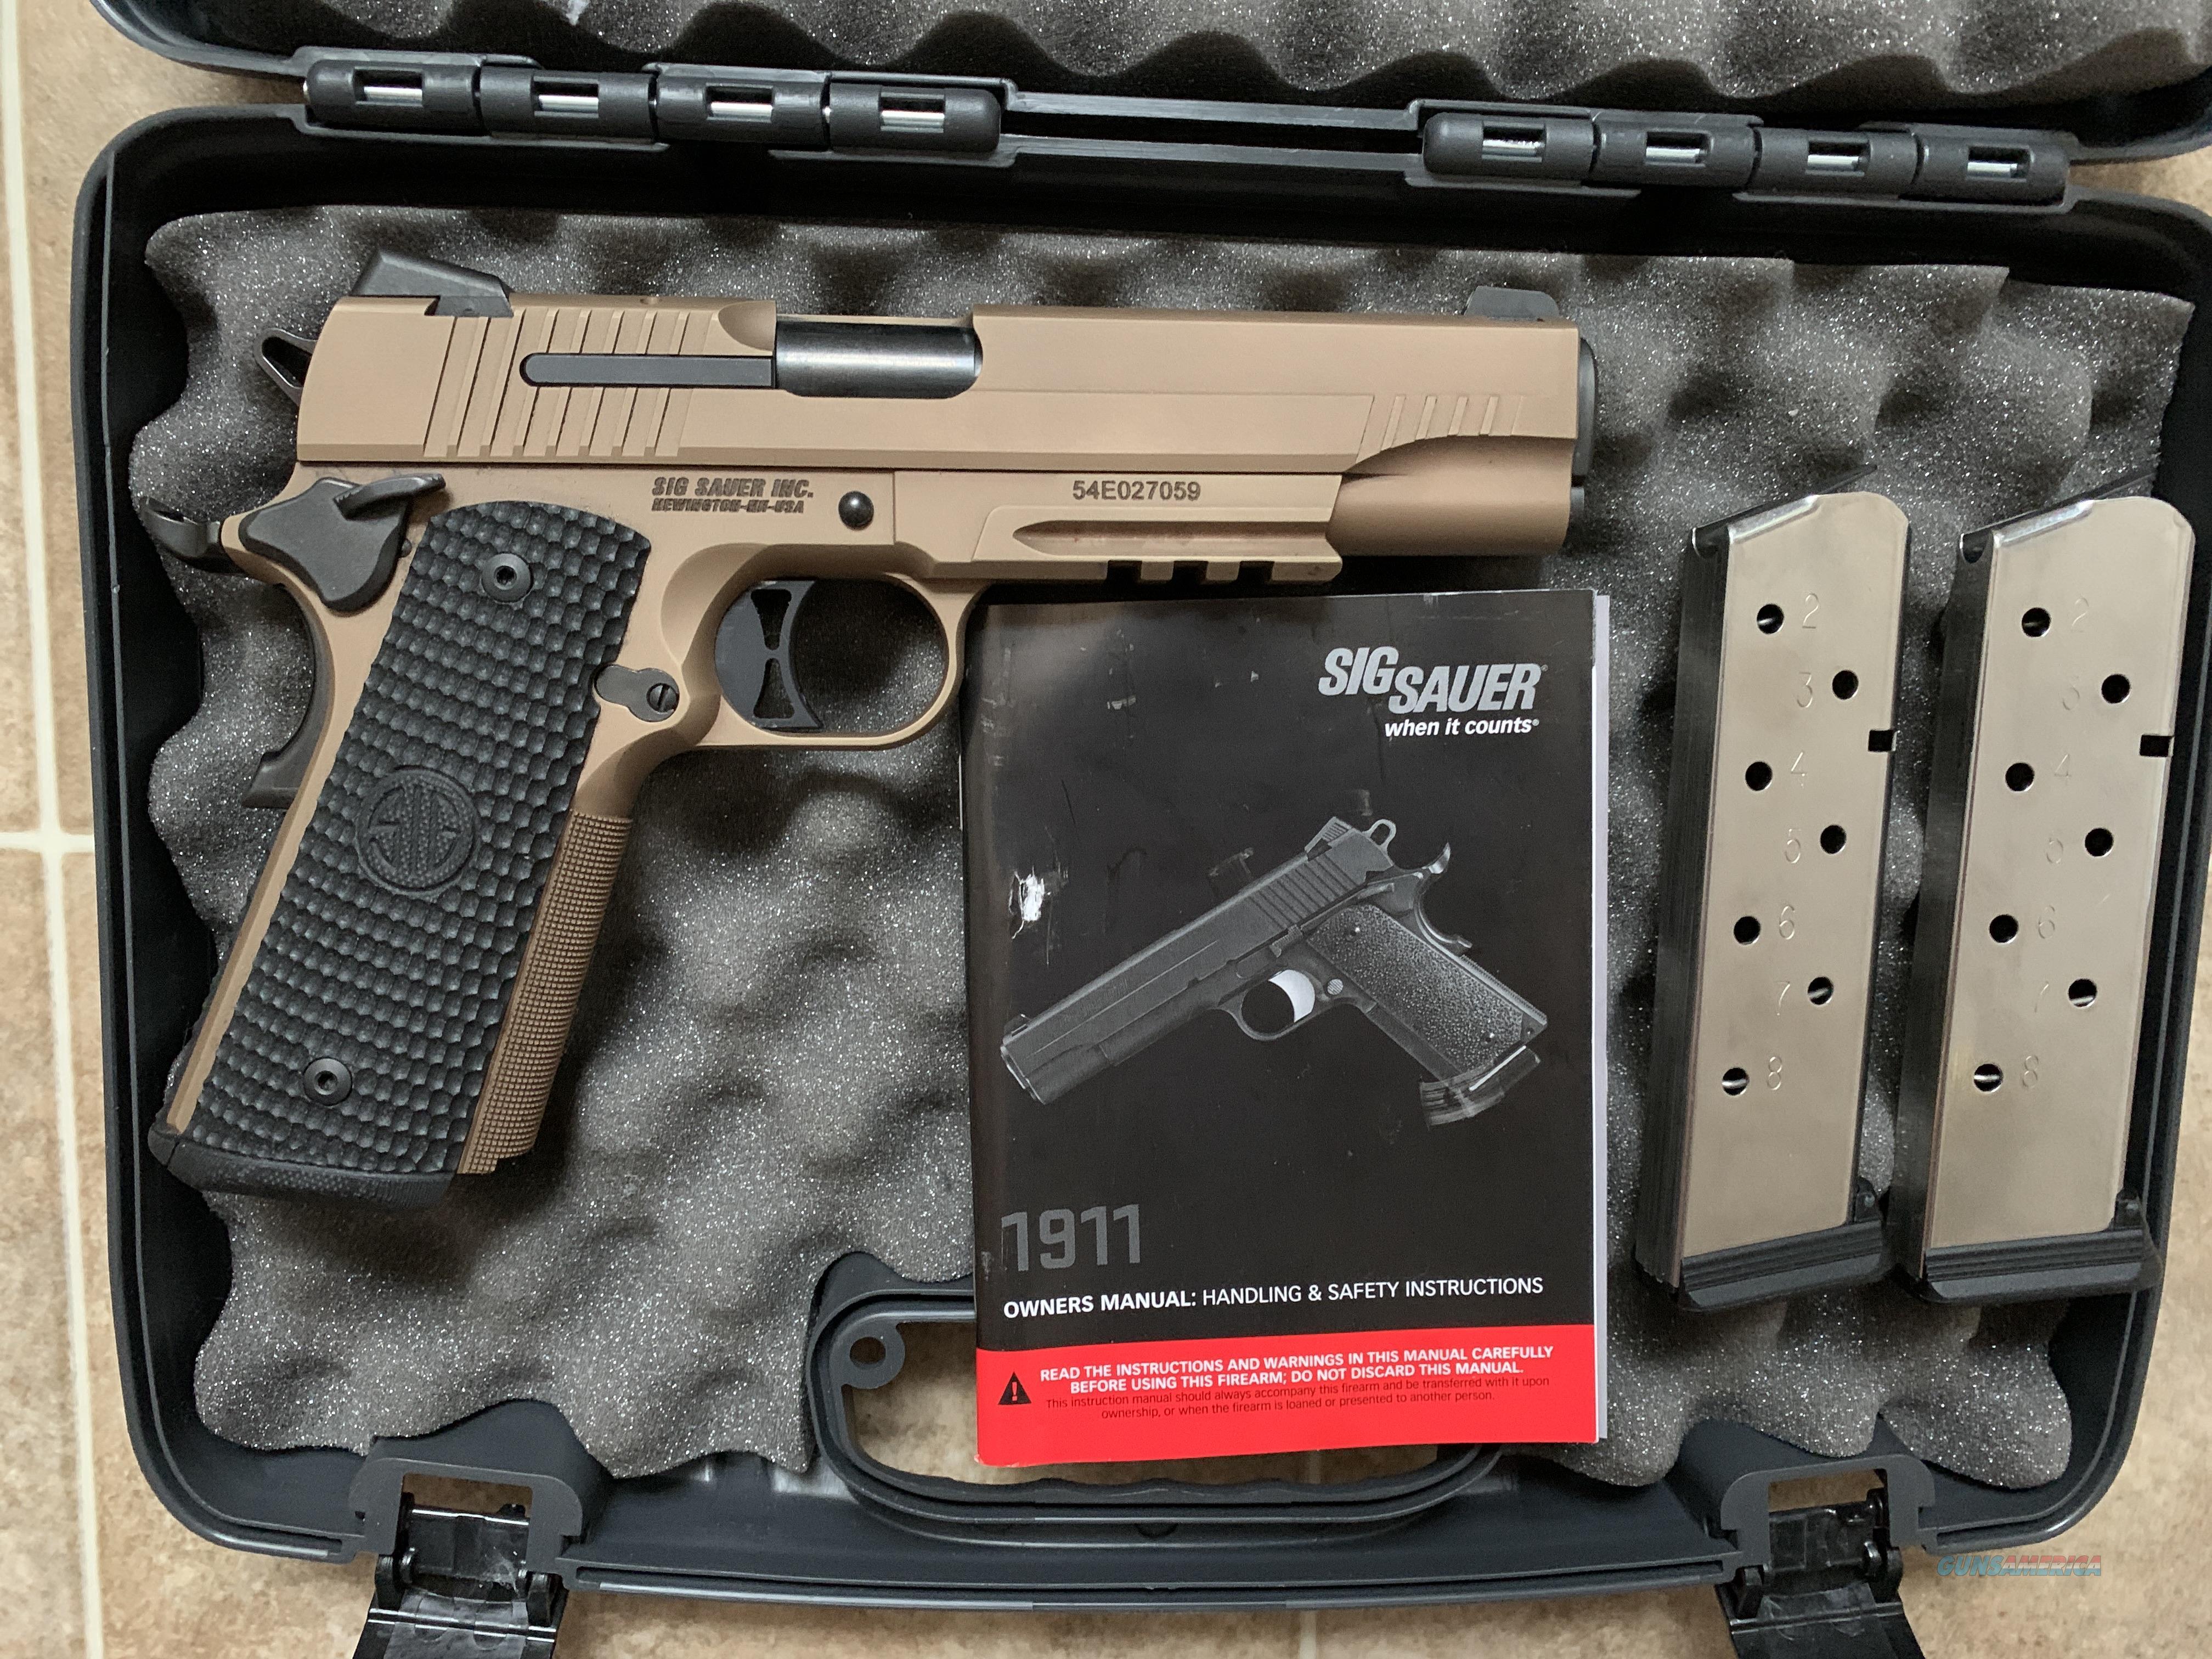 *LIKE NEW* Sig Sauer 1911 Emperor Scorpion   Guns > Pistols > 1911 Pistol Copies (non-Colt)